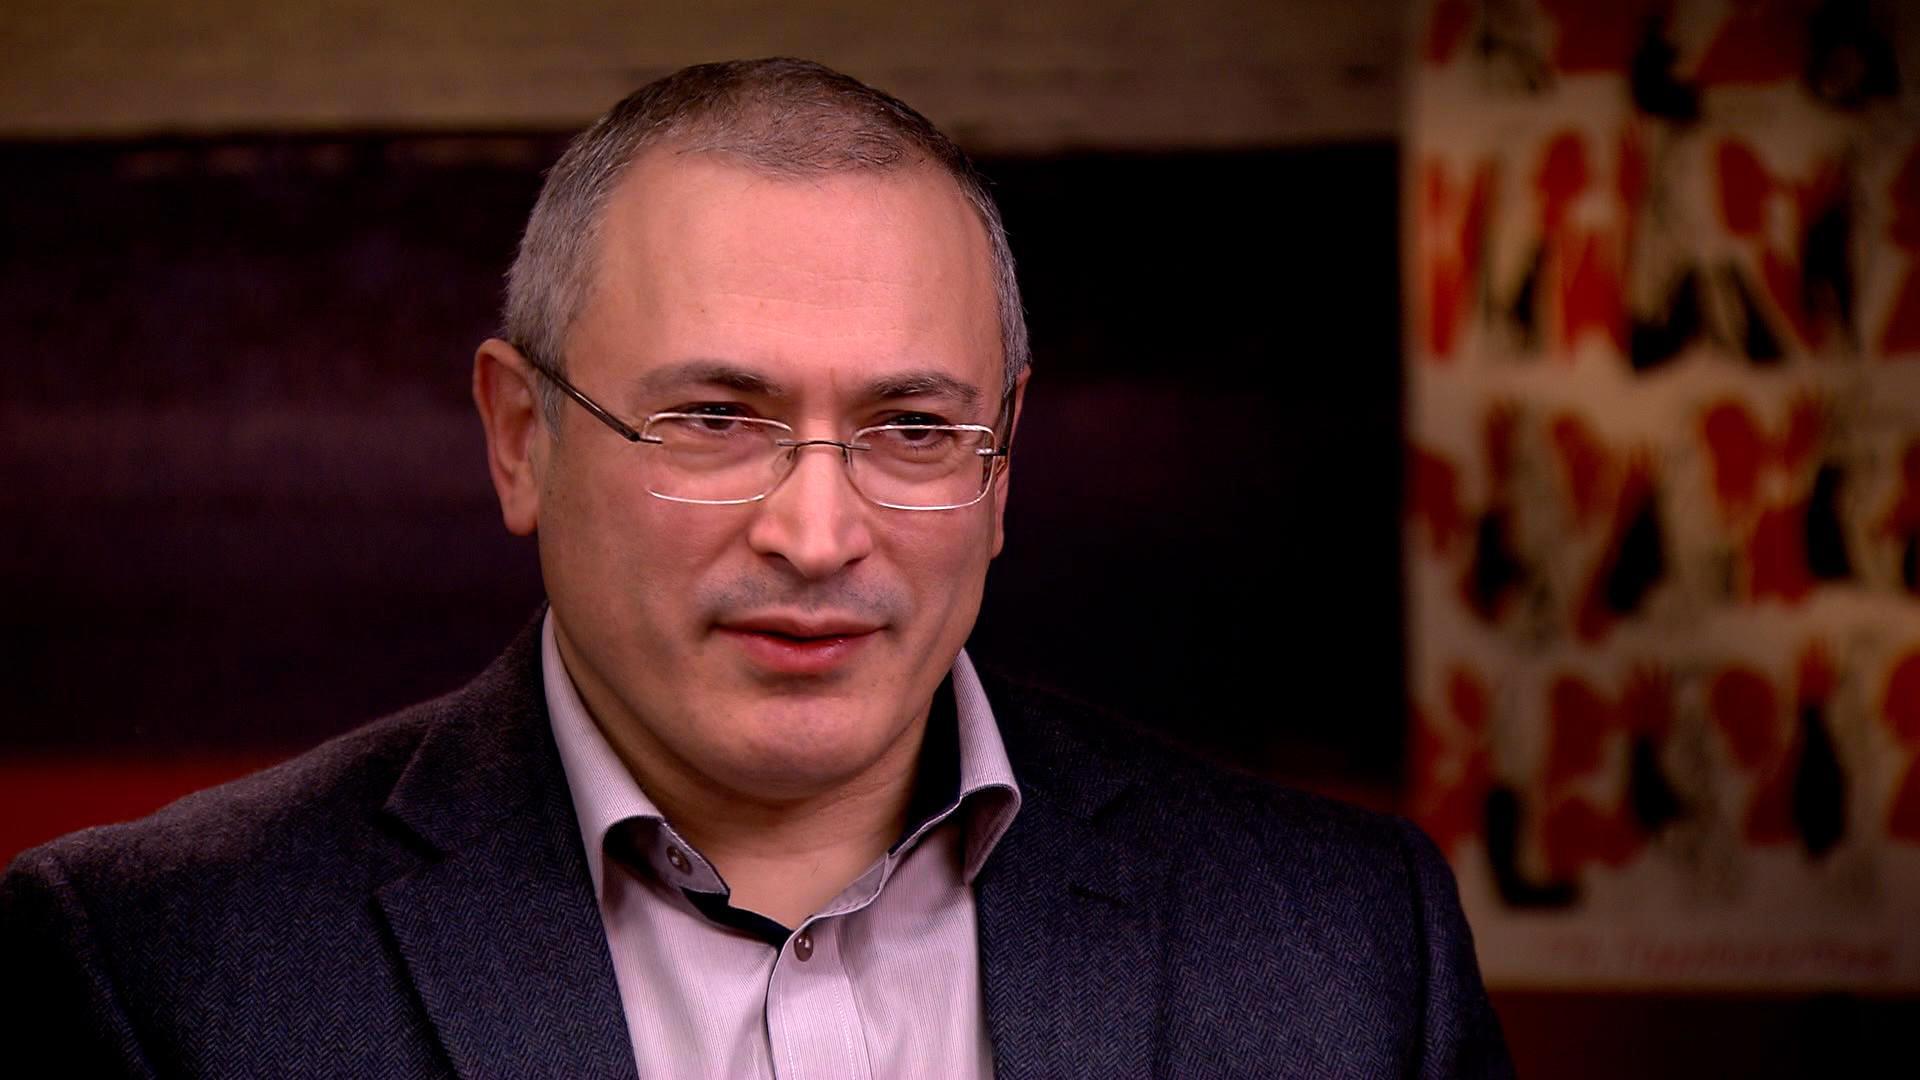 Vladimir Putin foe Mikhail Khodorkovsky exposes Russia elite's